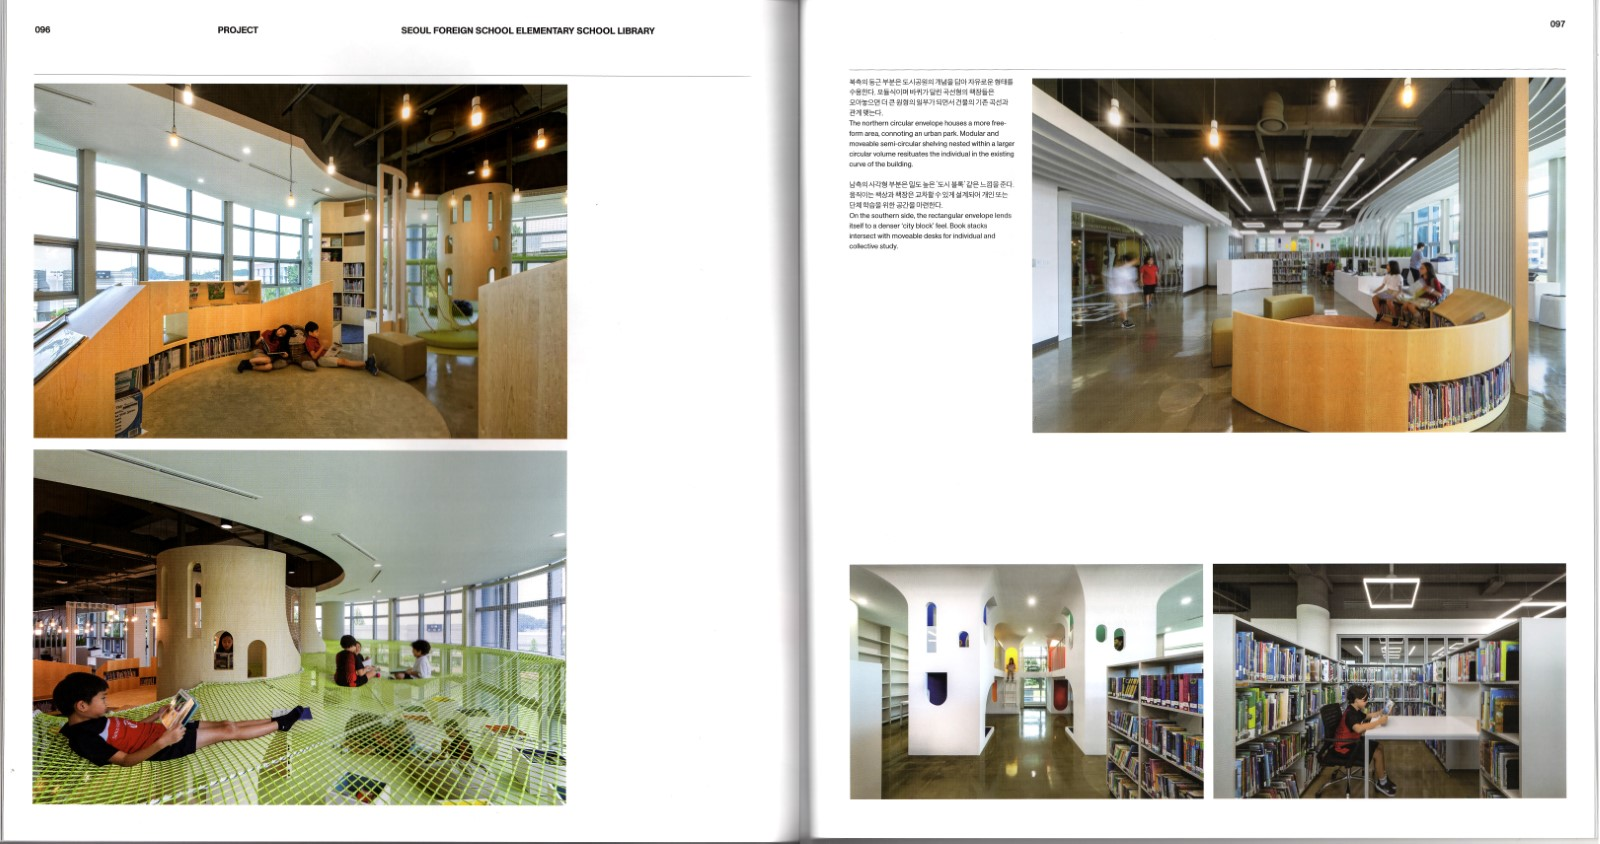 SFS Elementary School Library